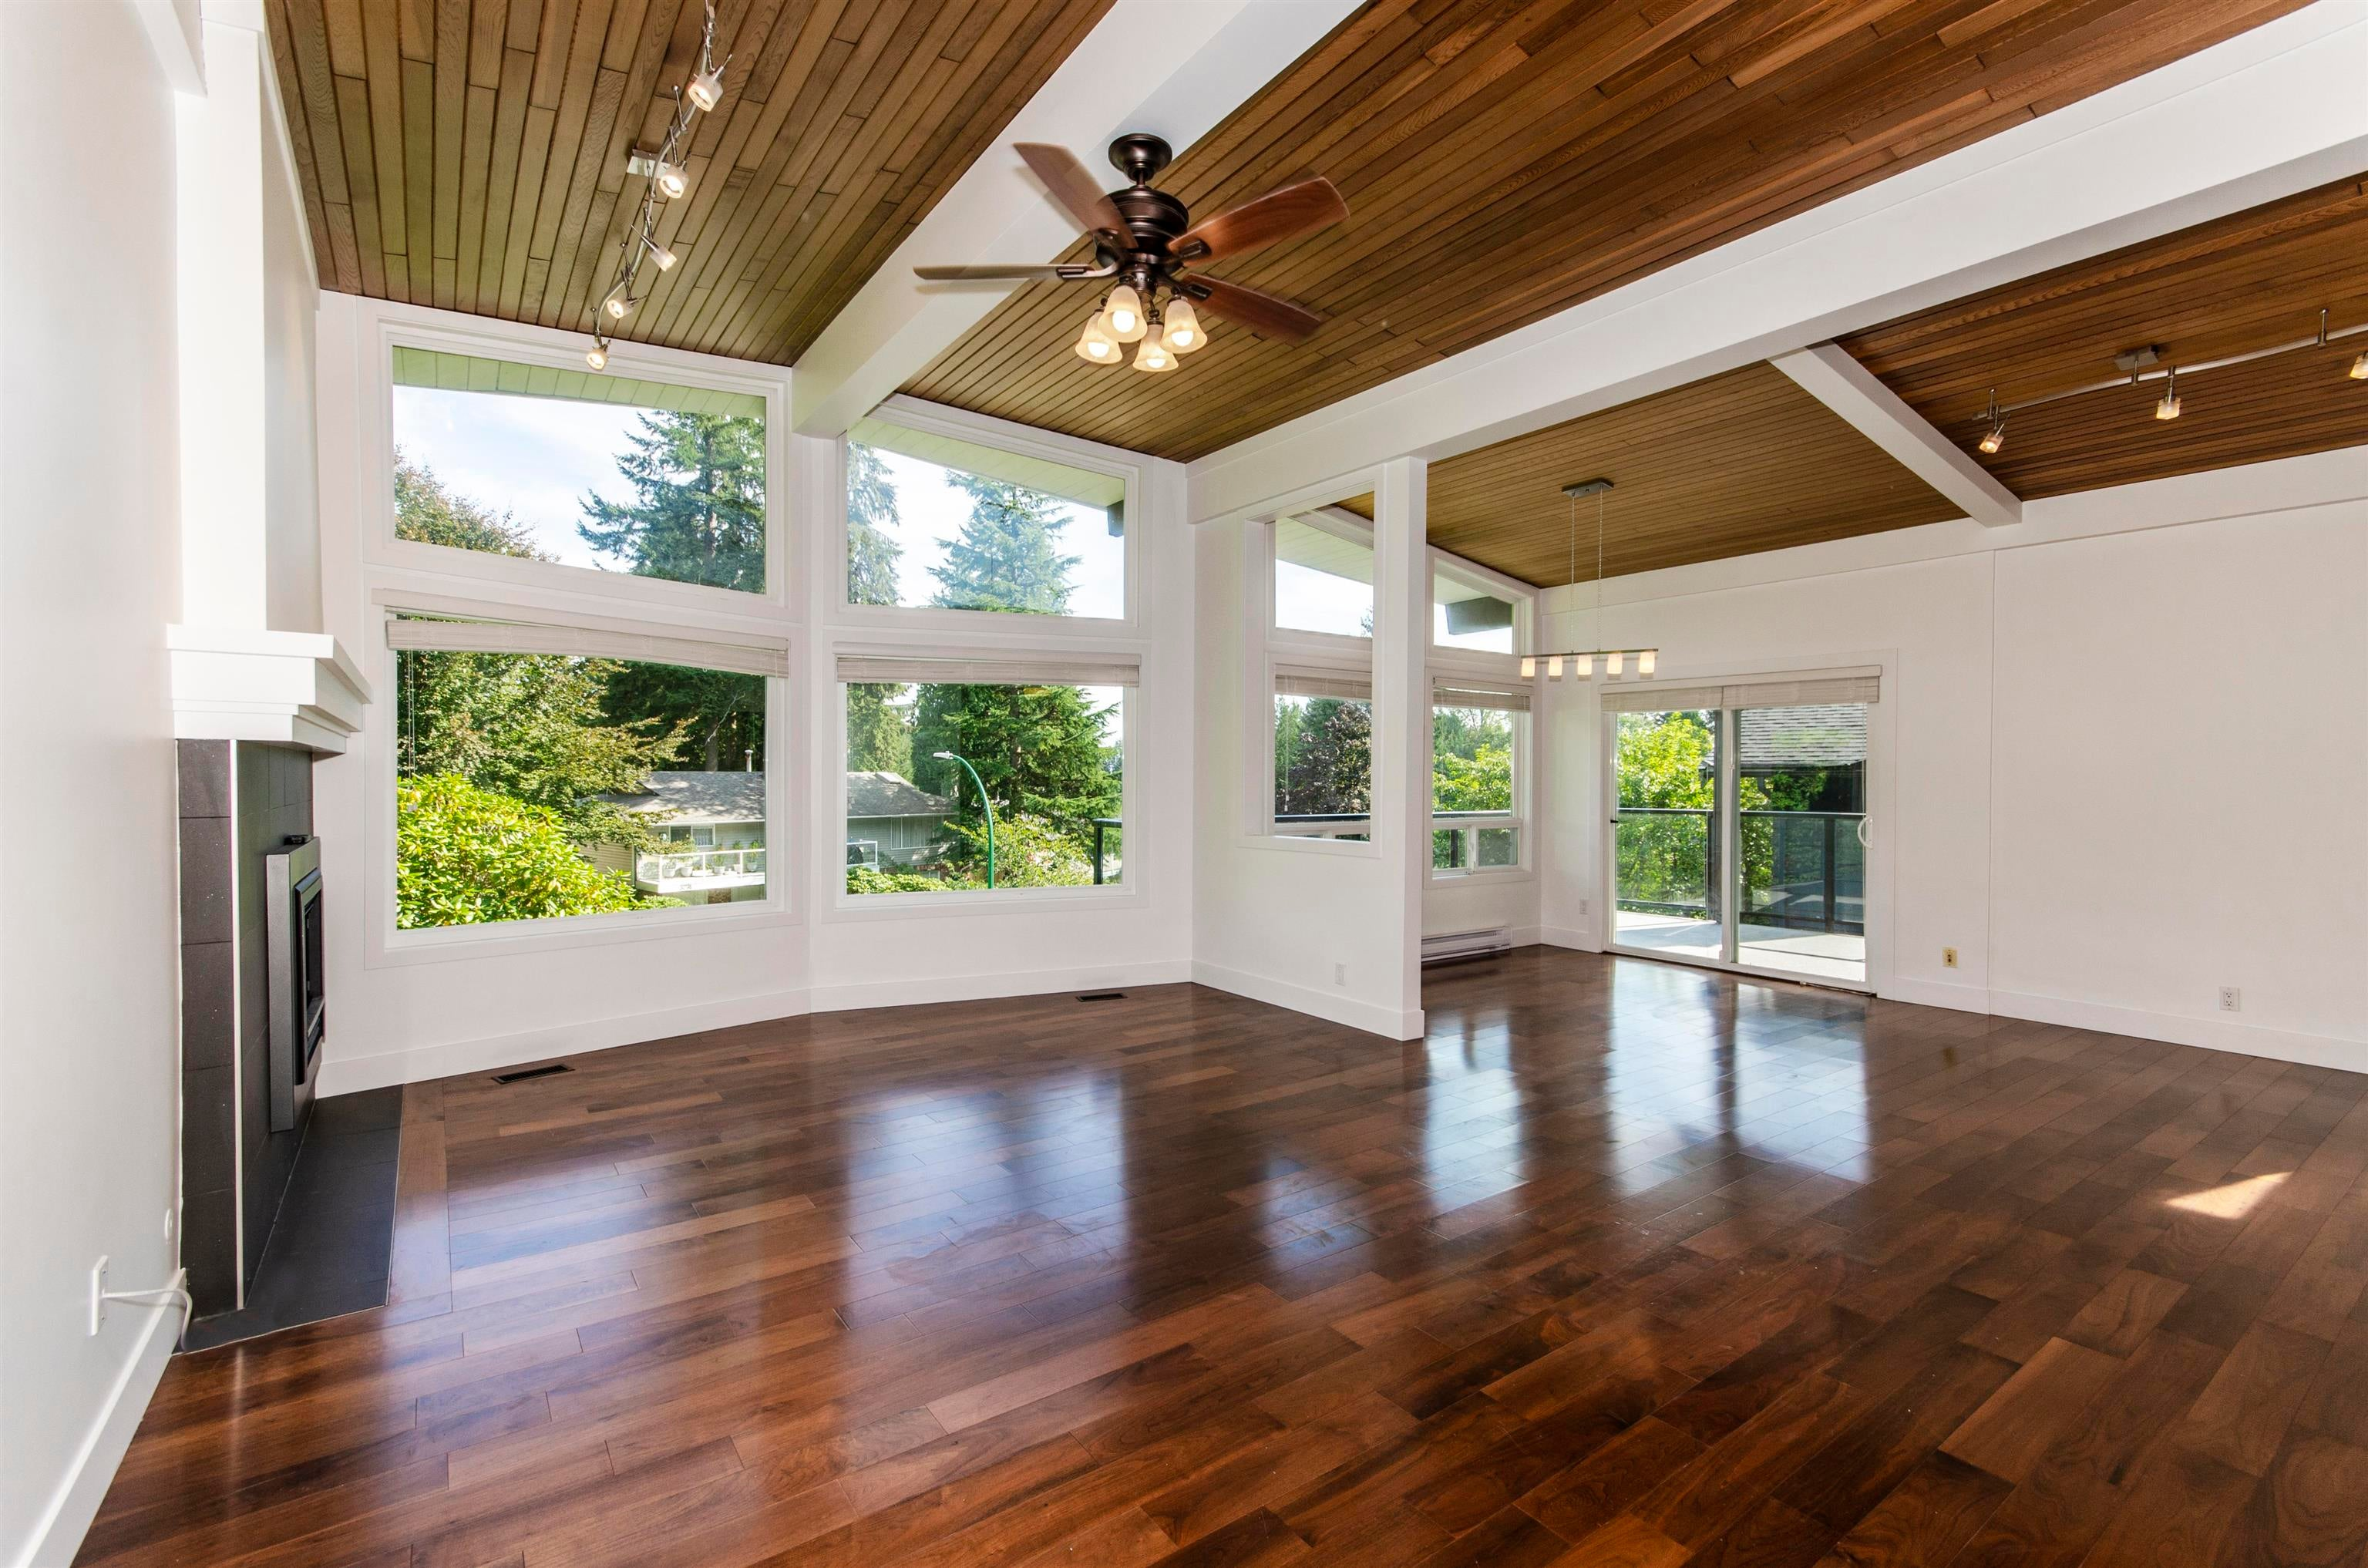 3785 REGENT AVENUE - Upper Lonsdale House/Single Family for sale, 4 Bedrooms (R2617648) - #7